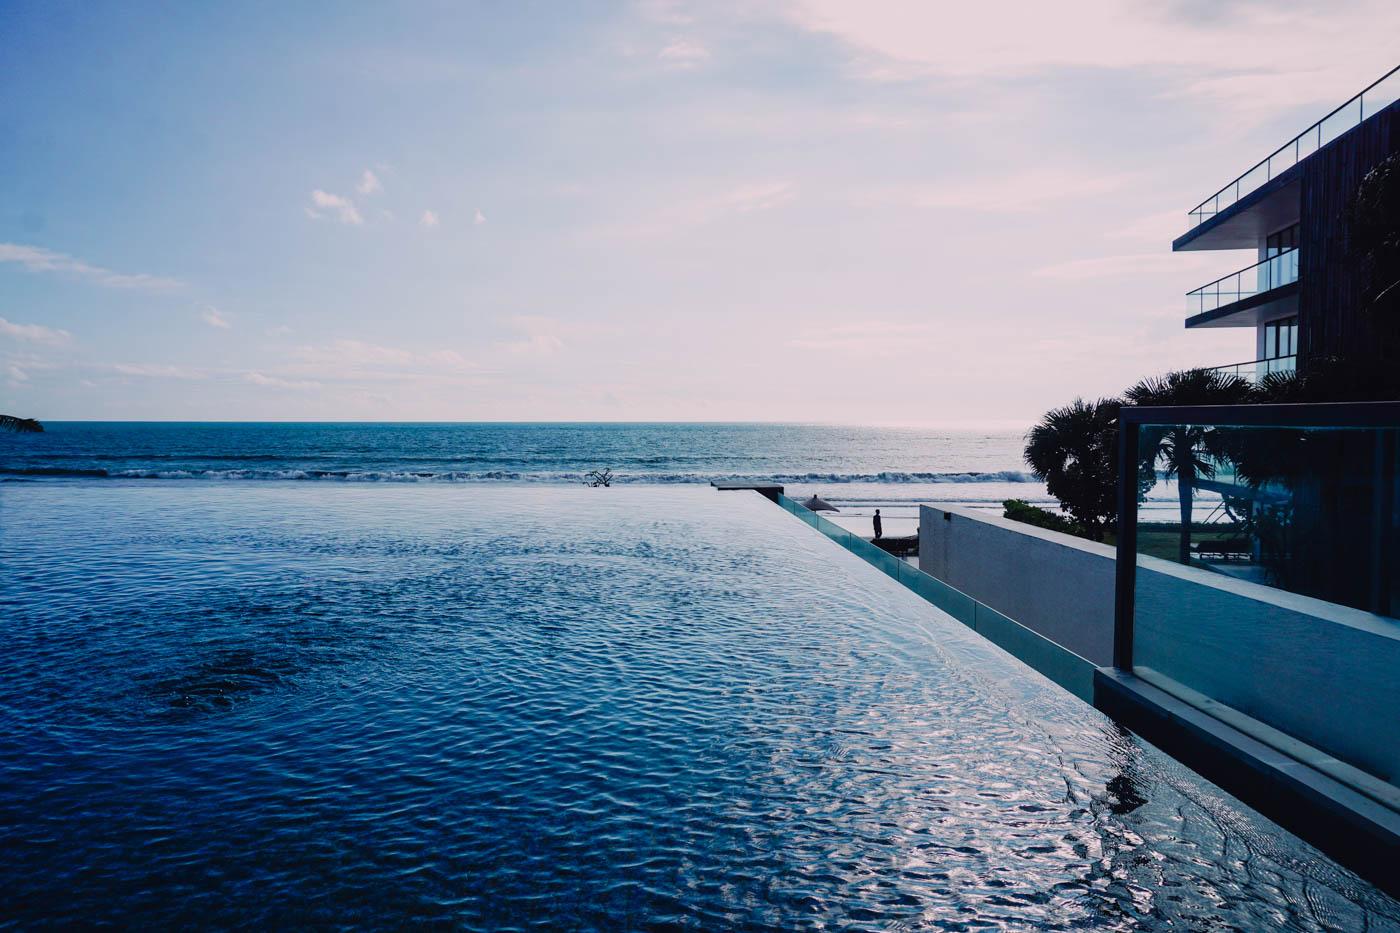 Alila Seminyak Bali, the best hotel in Bali #bali #luxury #luxuryhotels